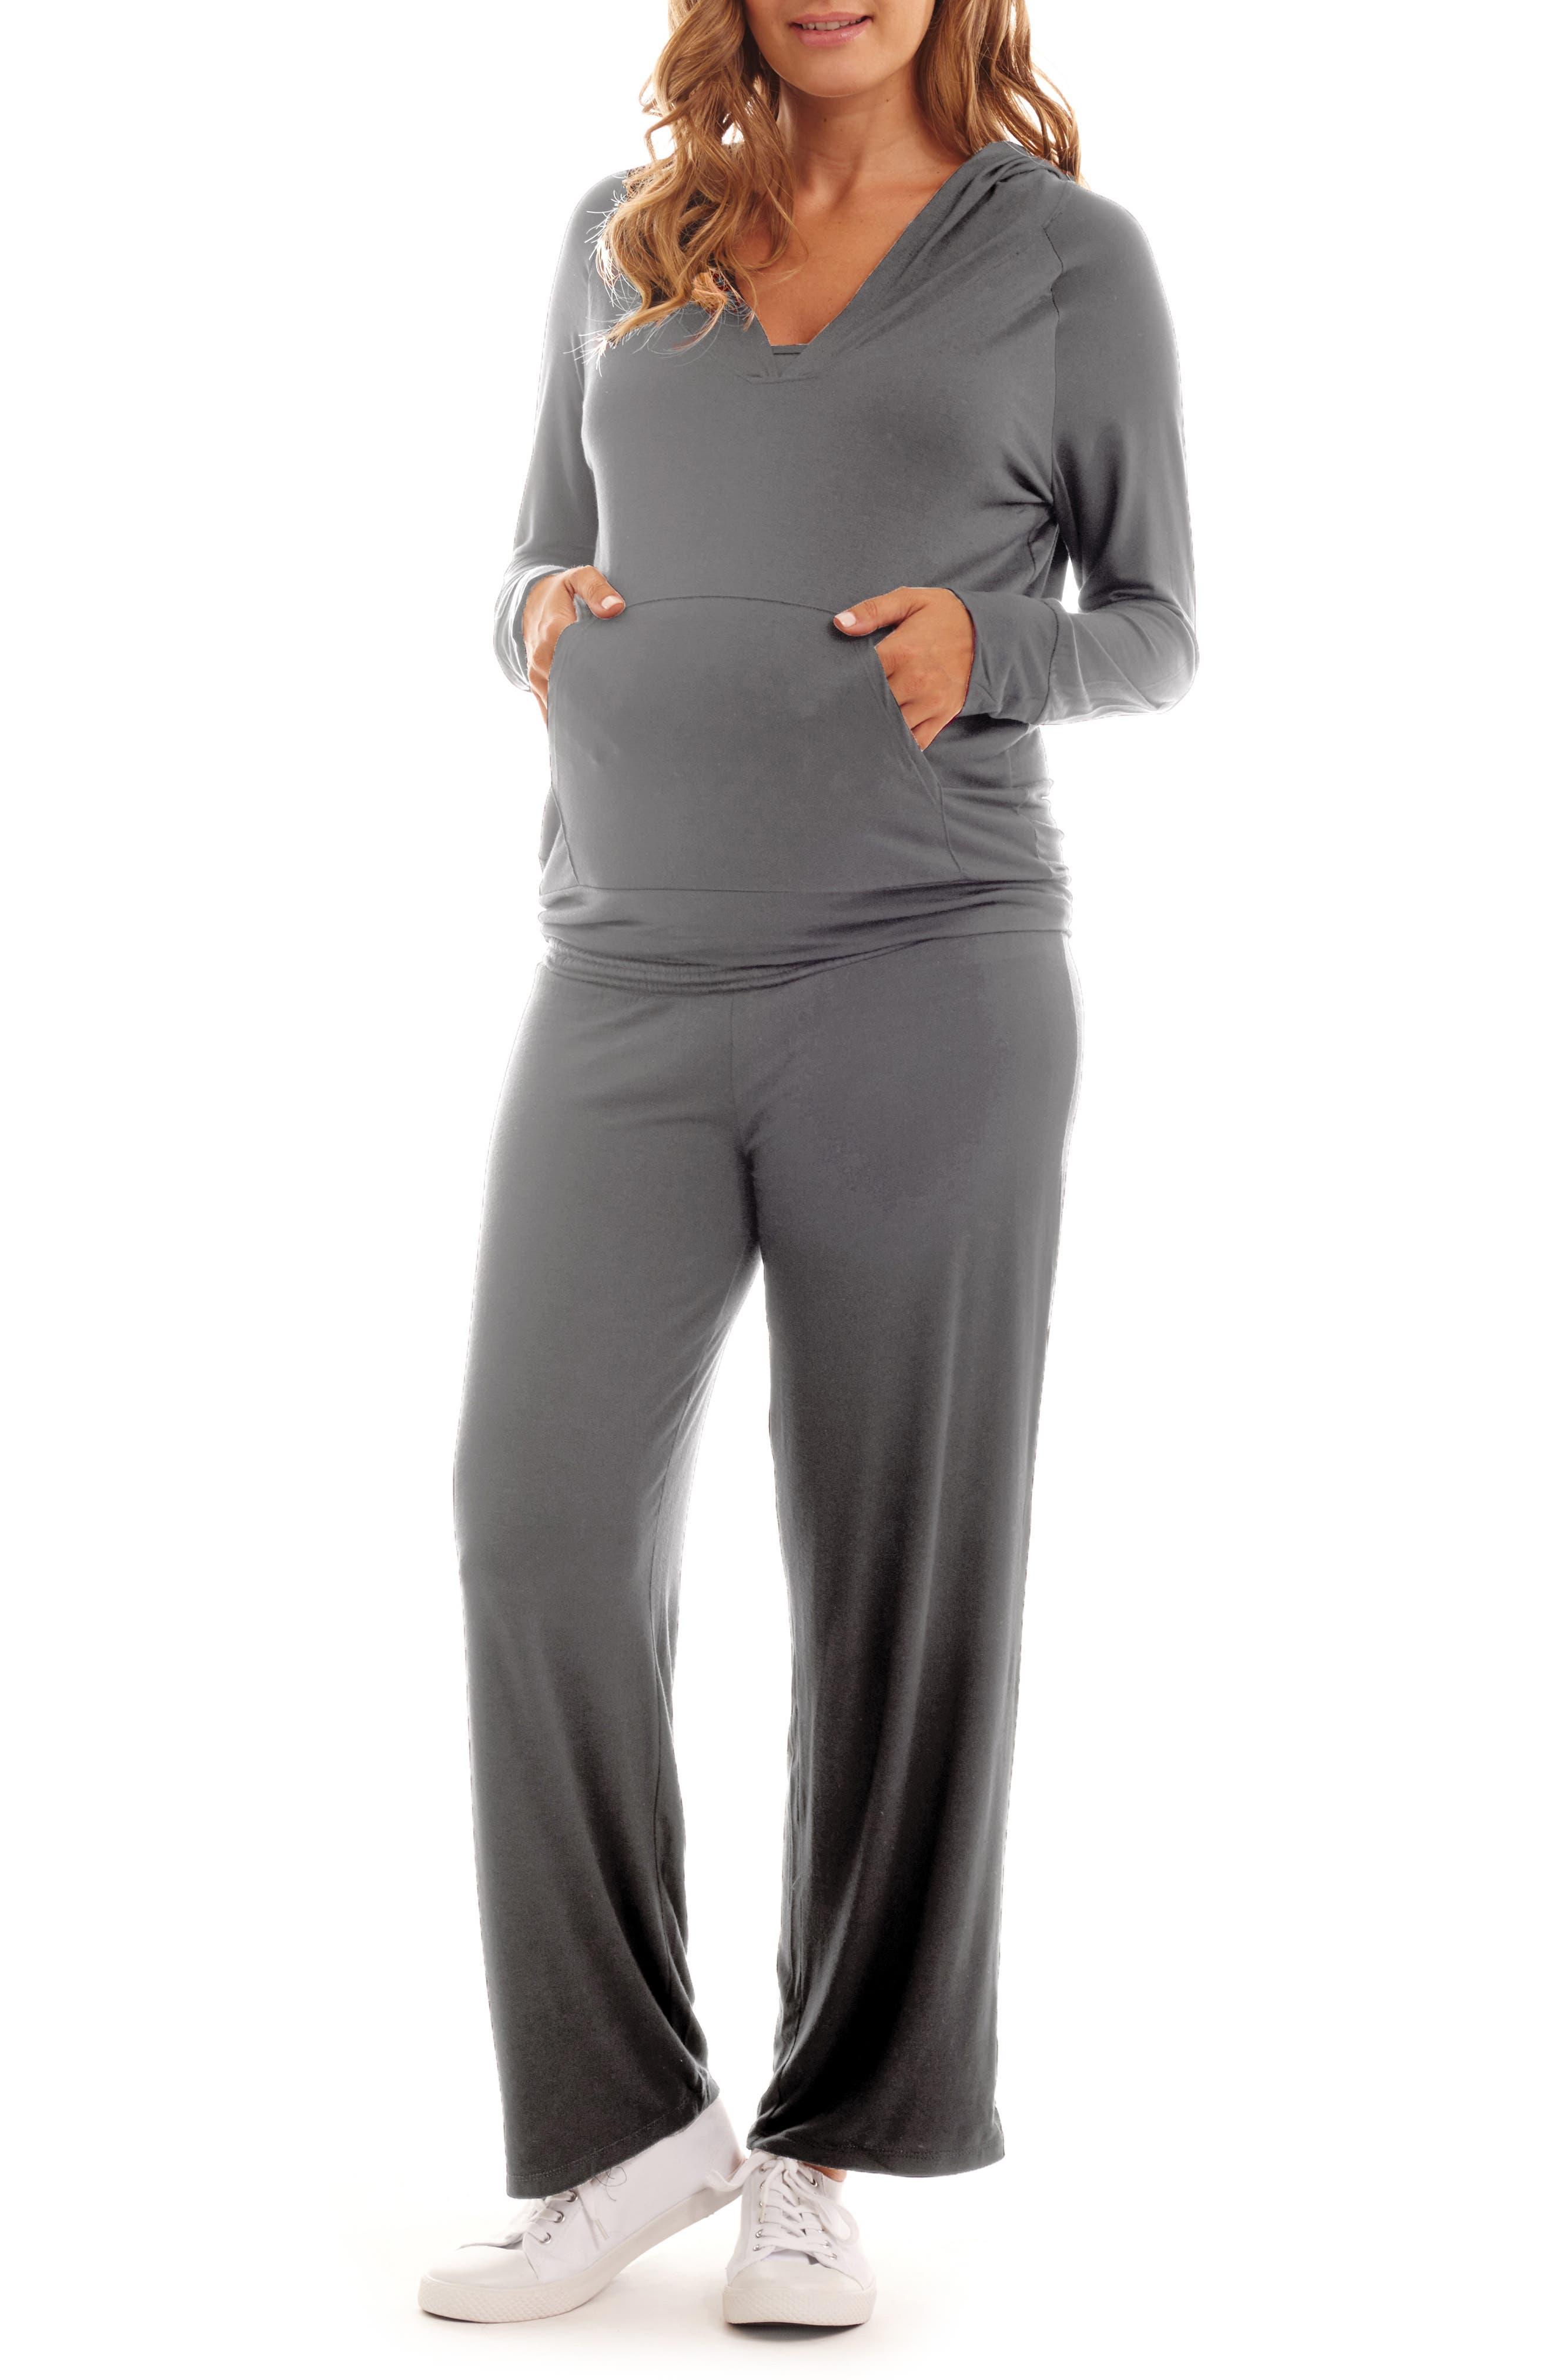 Women's Everly Grey Irene Maternity/nursing Hoodie & Pants Set